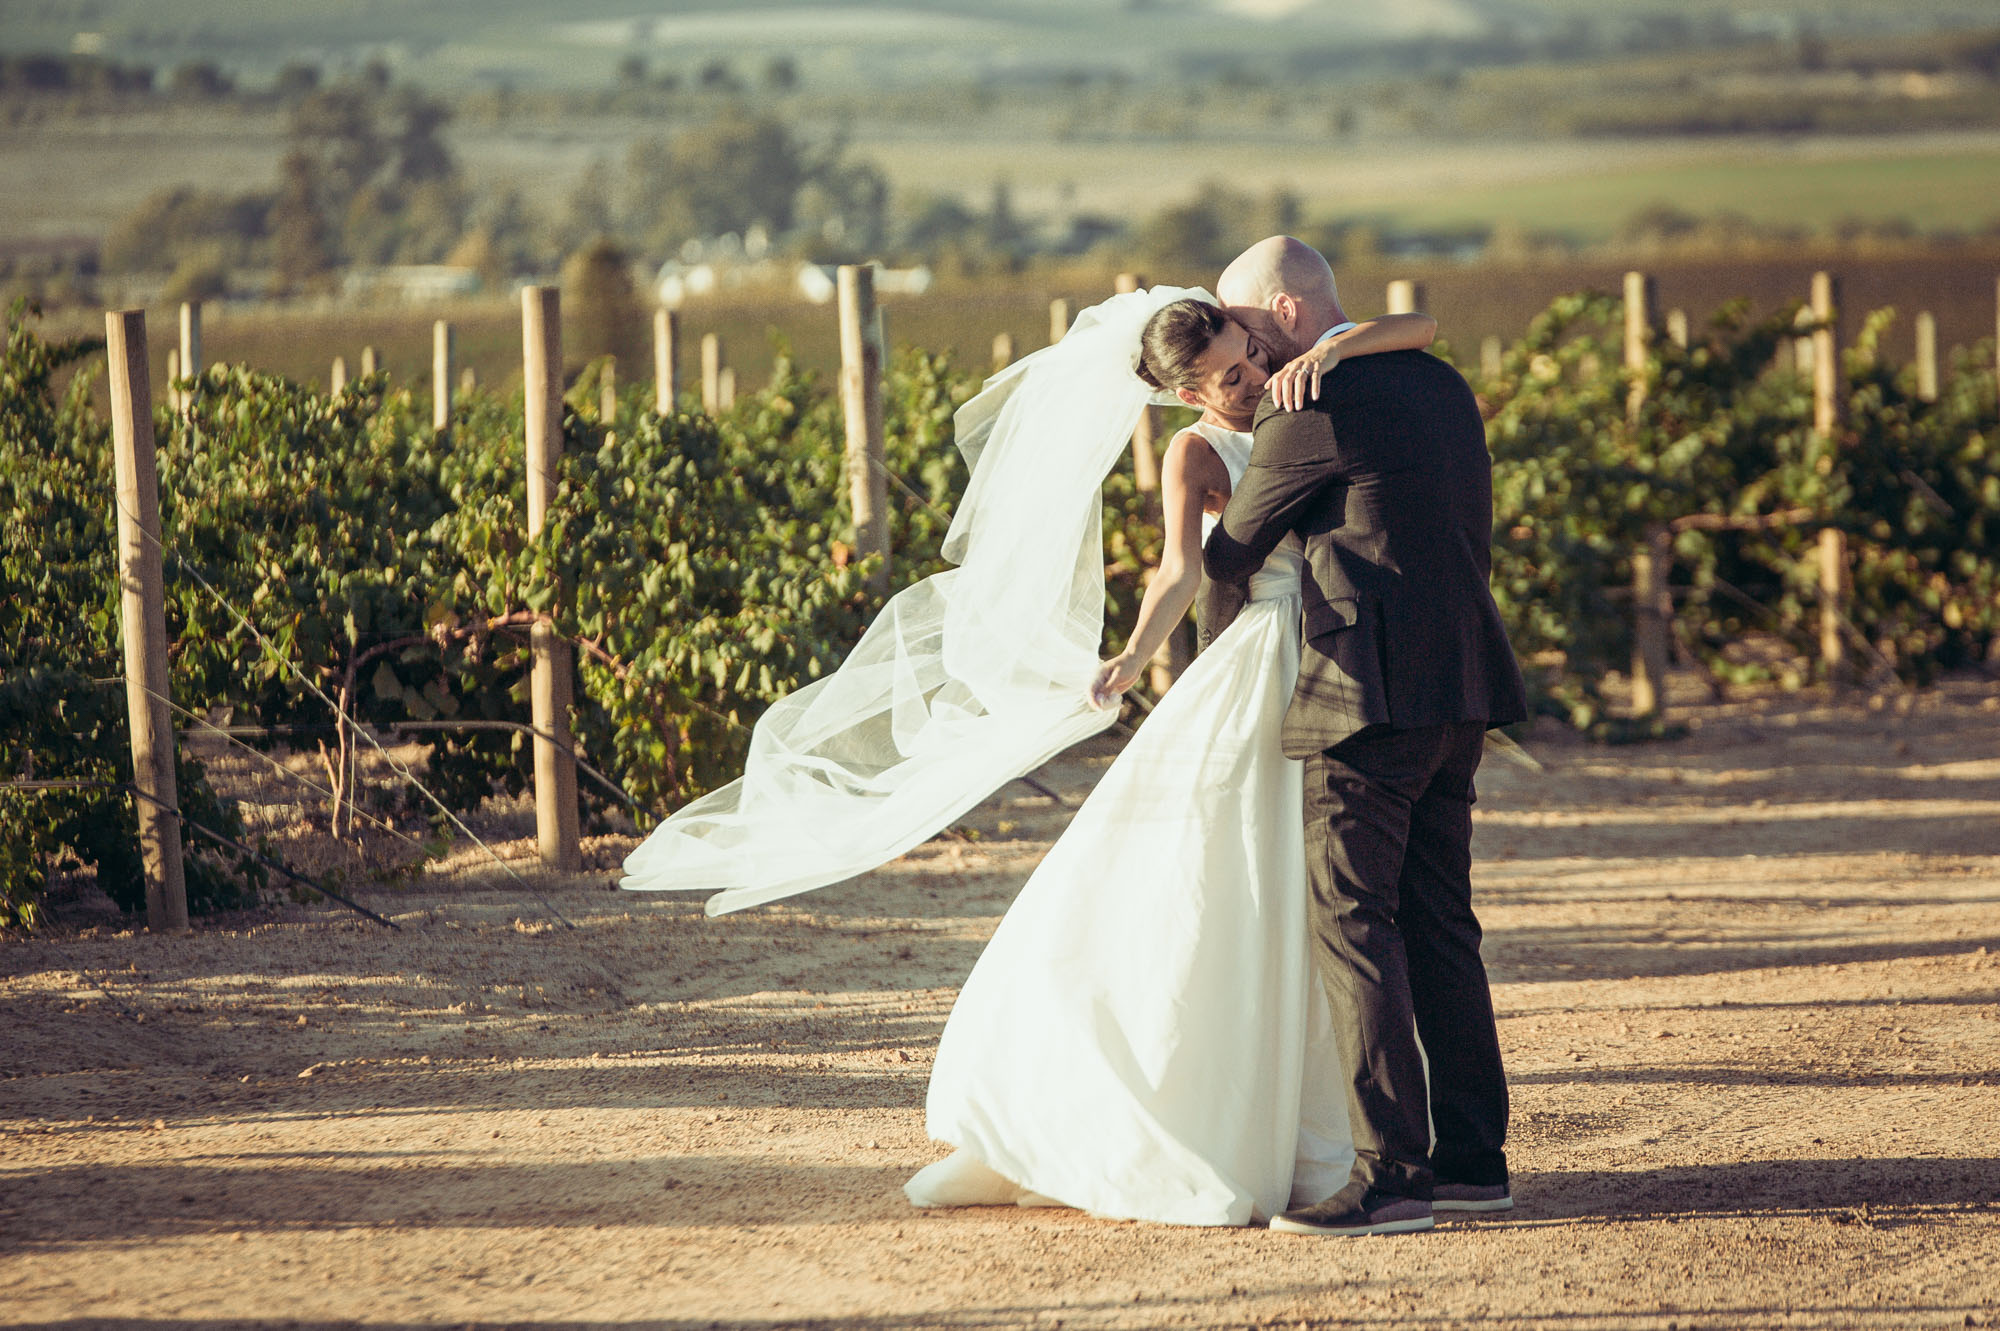 john-henry-wedding-photographer-kiara-ashley-001-21.jpg